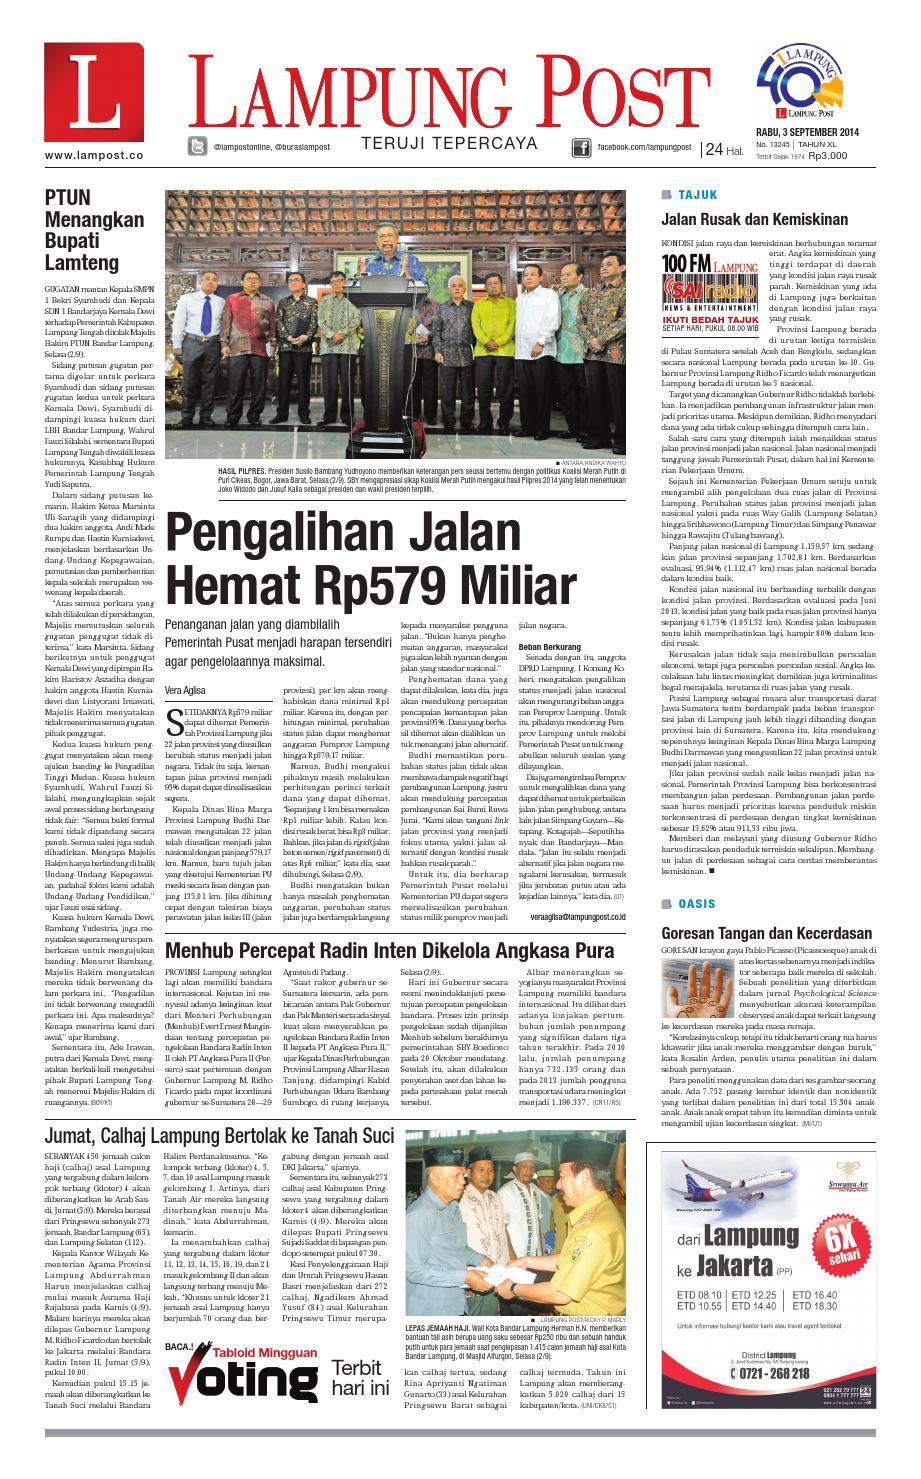 Lampung Post Rabu 3 September 2014 By Issuu Produk Ukm Bumn Sulam Usus Pmk